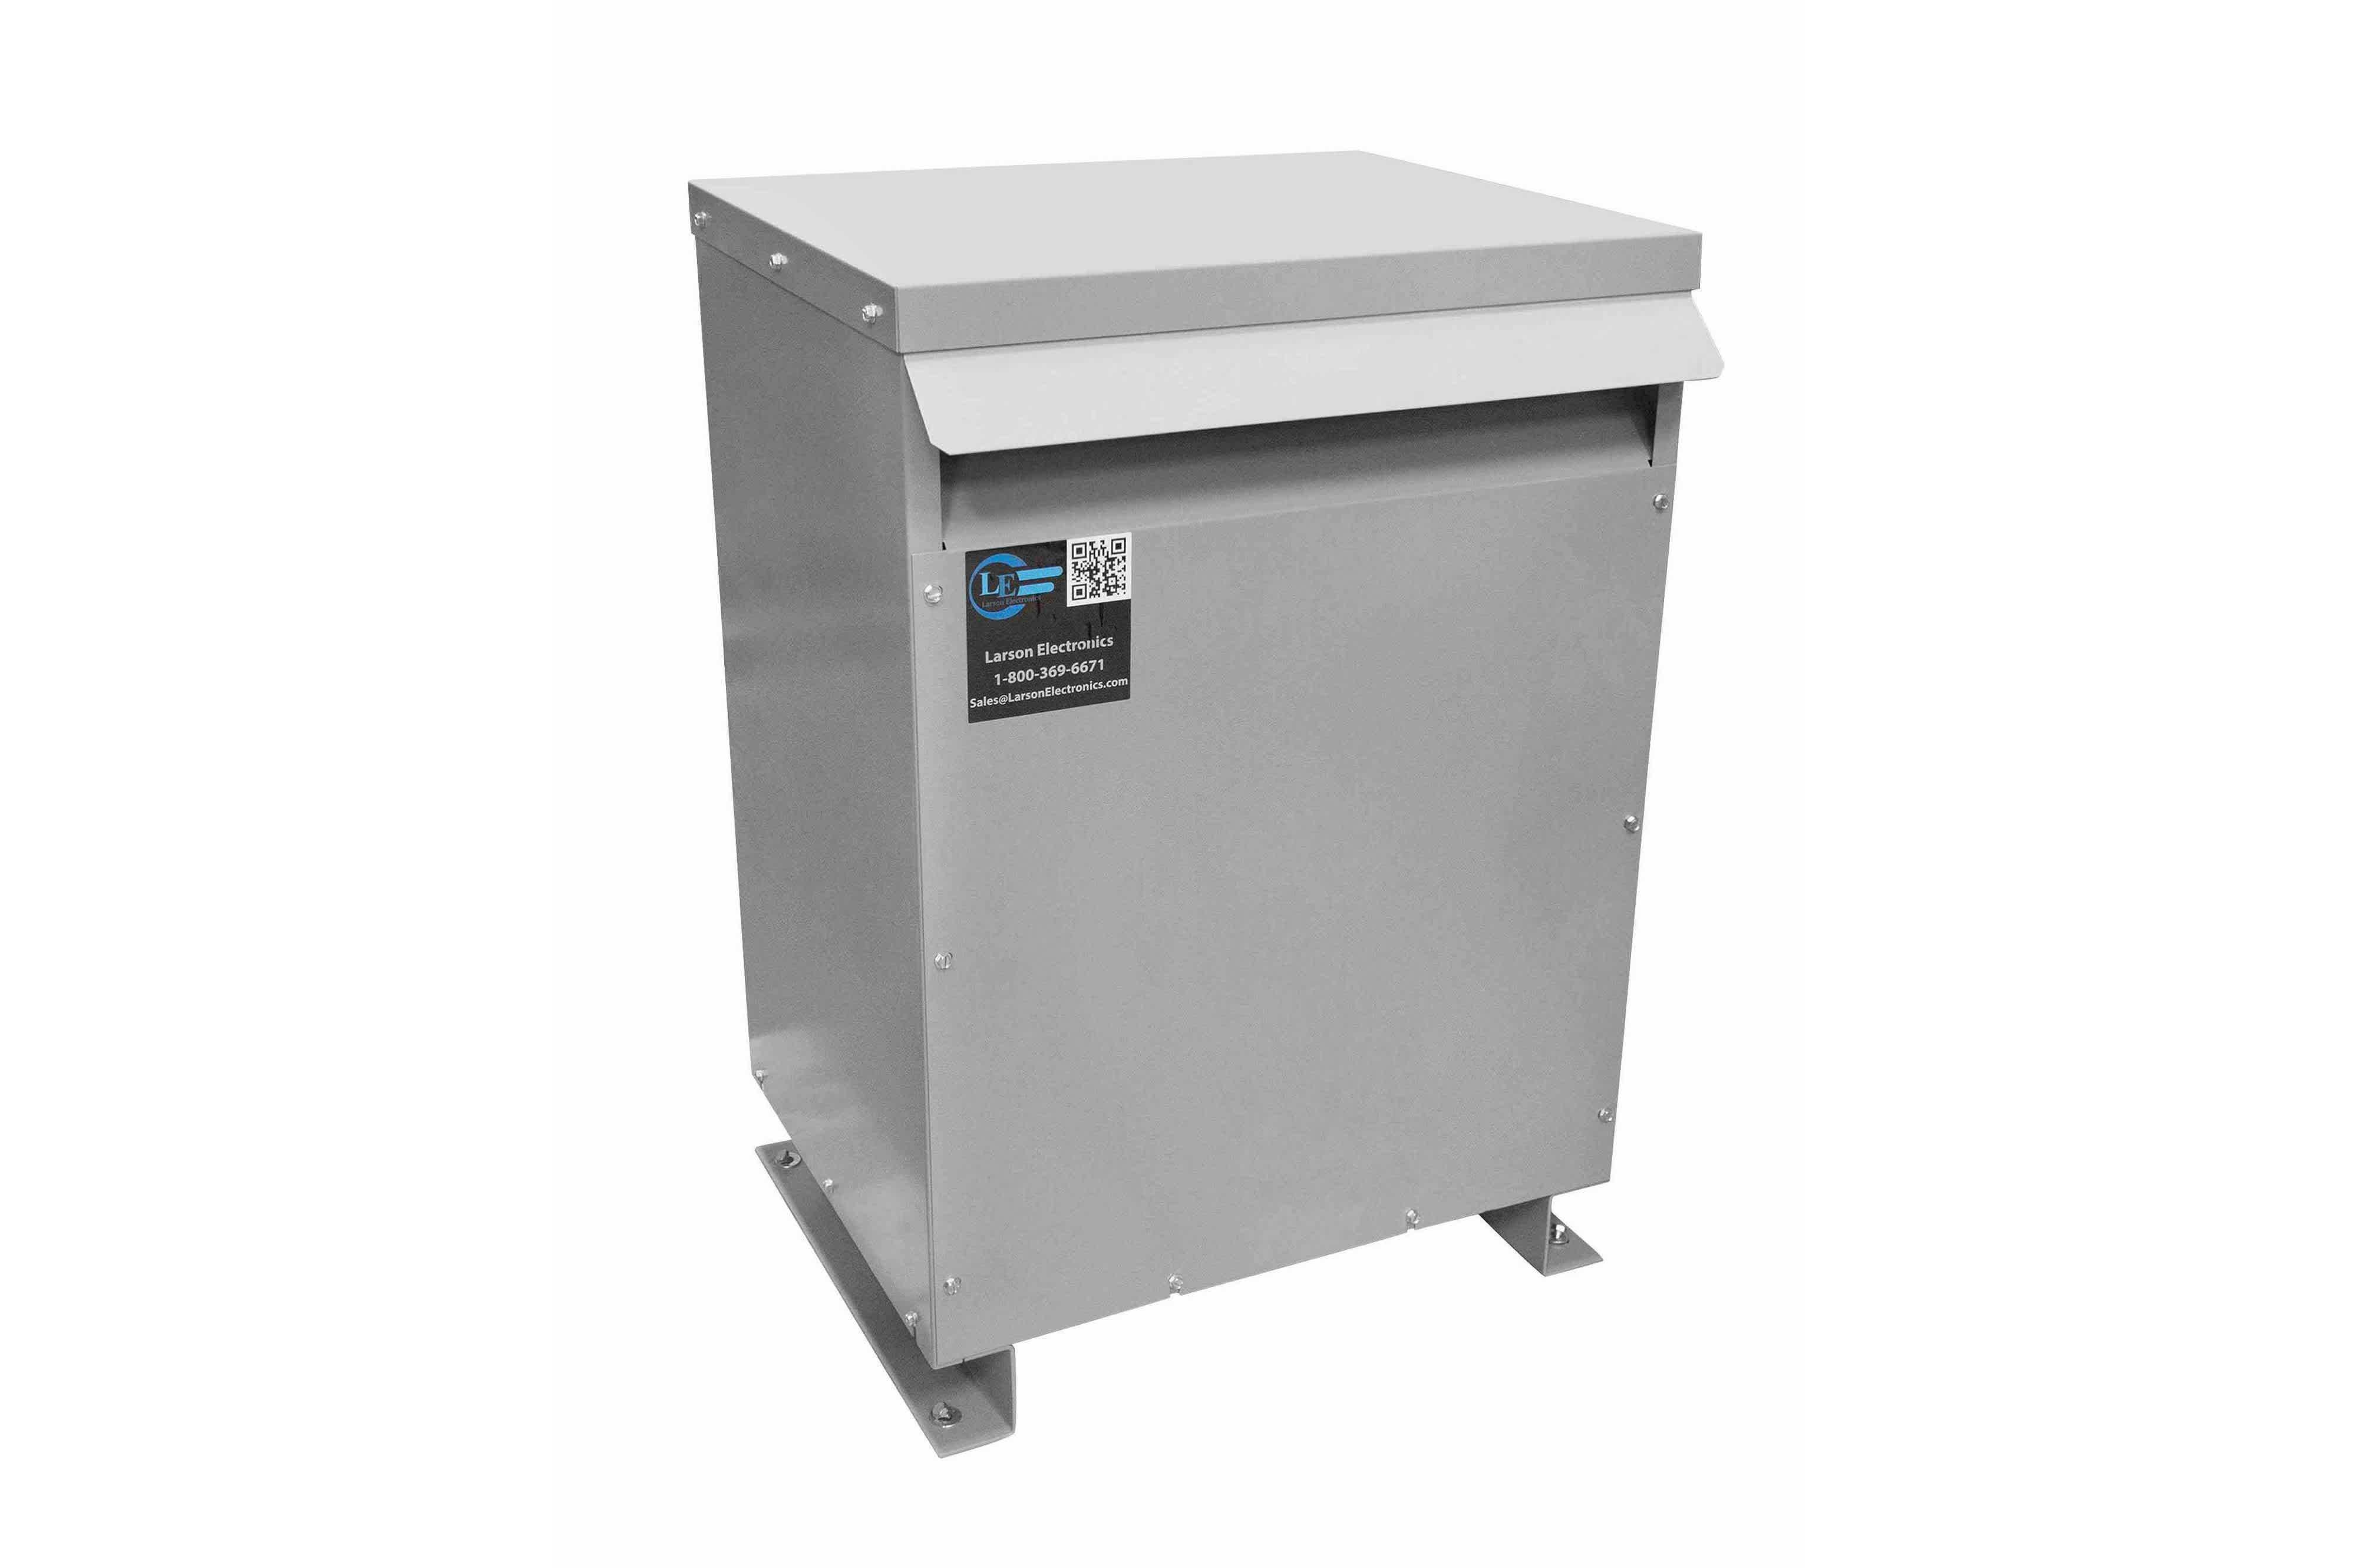 200 kVA 3PH Isolation Transformer, 415V Wye Primary, 208Y/120 Wye-N Secondary, N3R, Ventilated, 60 Hz